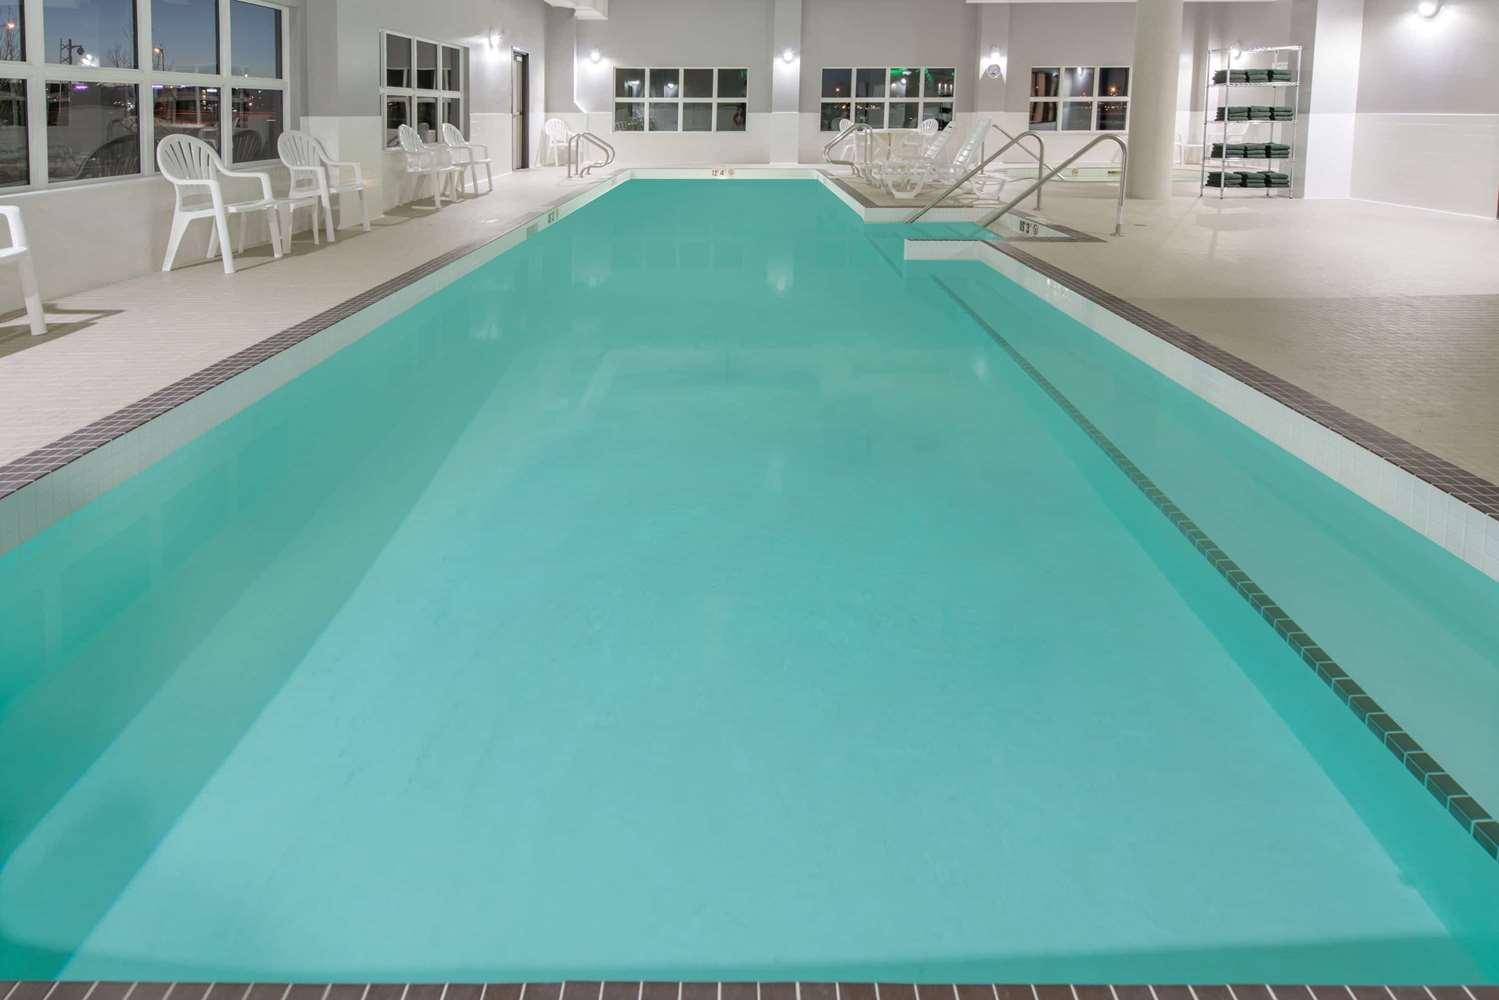 Pool - Wyndham Garden Hotel Airport Calgary